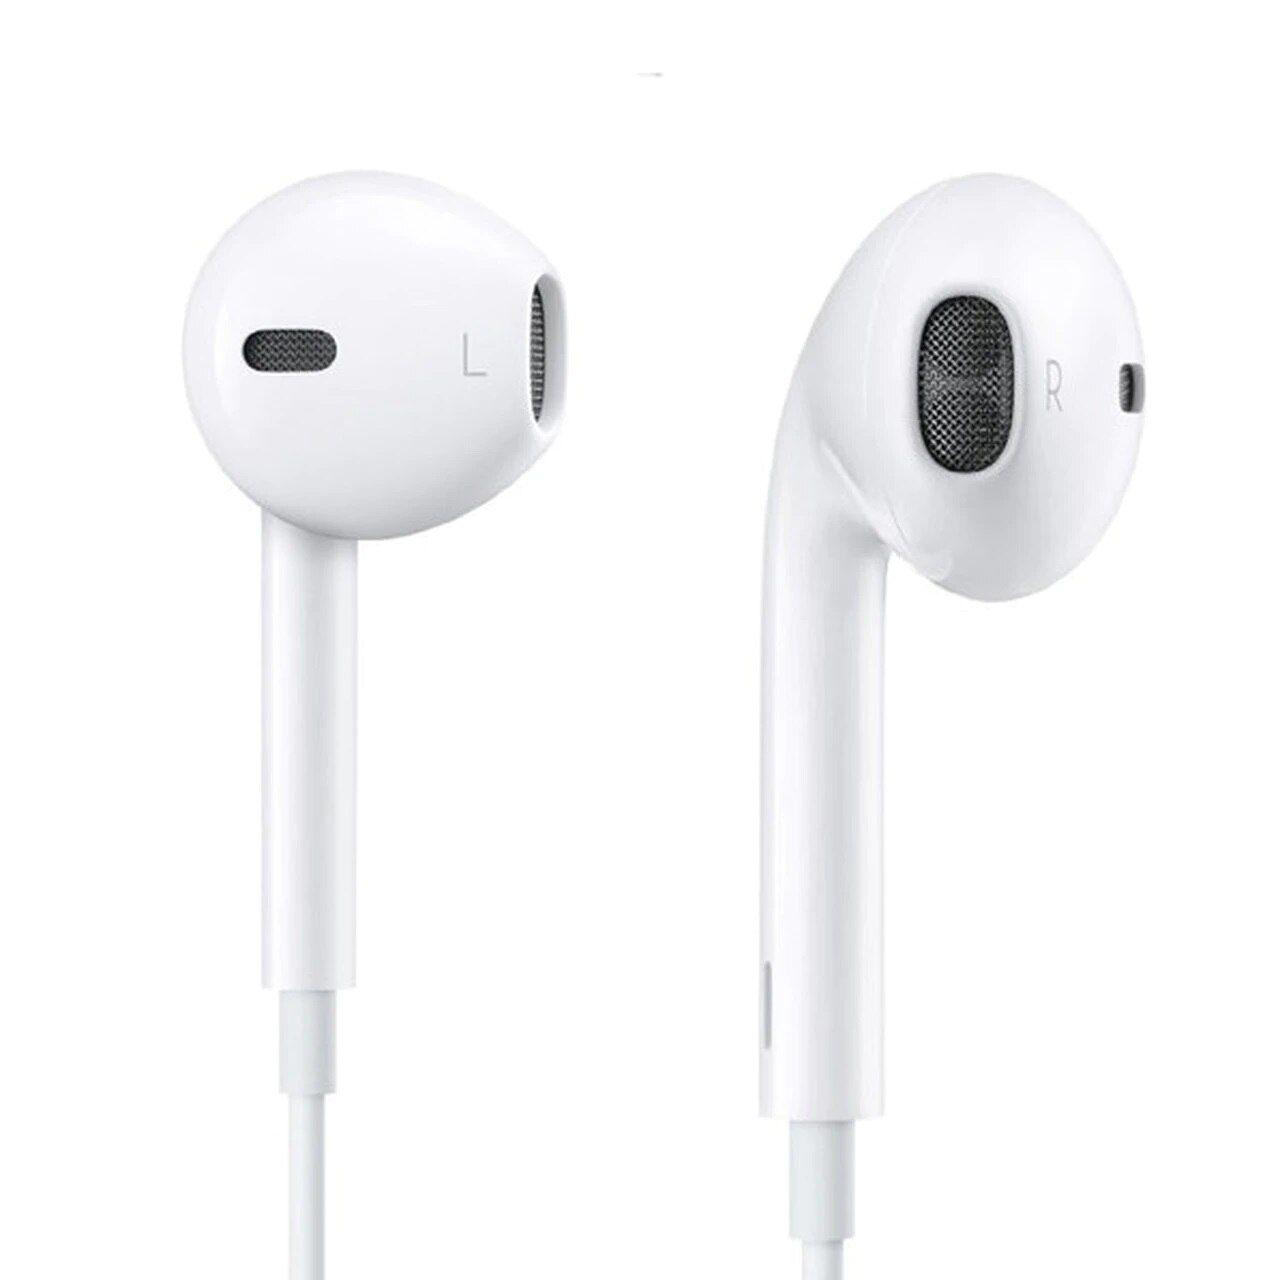 Apple Earphone 3 5 Mm Universal Headphones With Remote And Mic White Refurbished Apple Earphones Earphone Remote